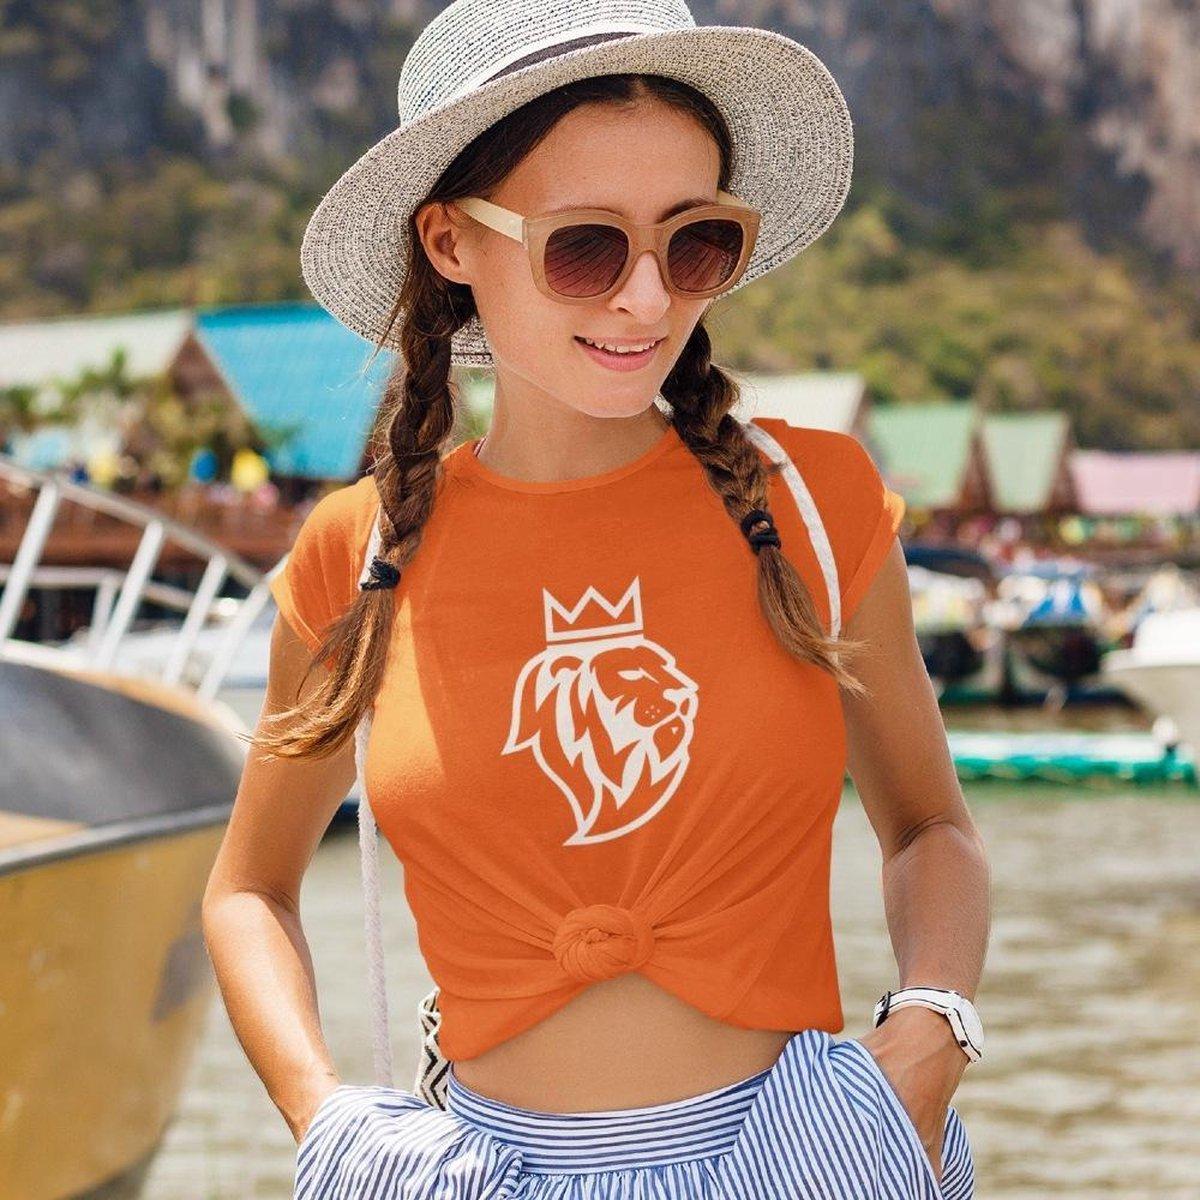 EK WK & Koningsdag T-Shirt De Leeuw (DAMES - MAAT M) | Oranje Kleding | Feestkleding